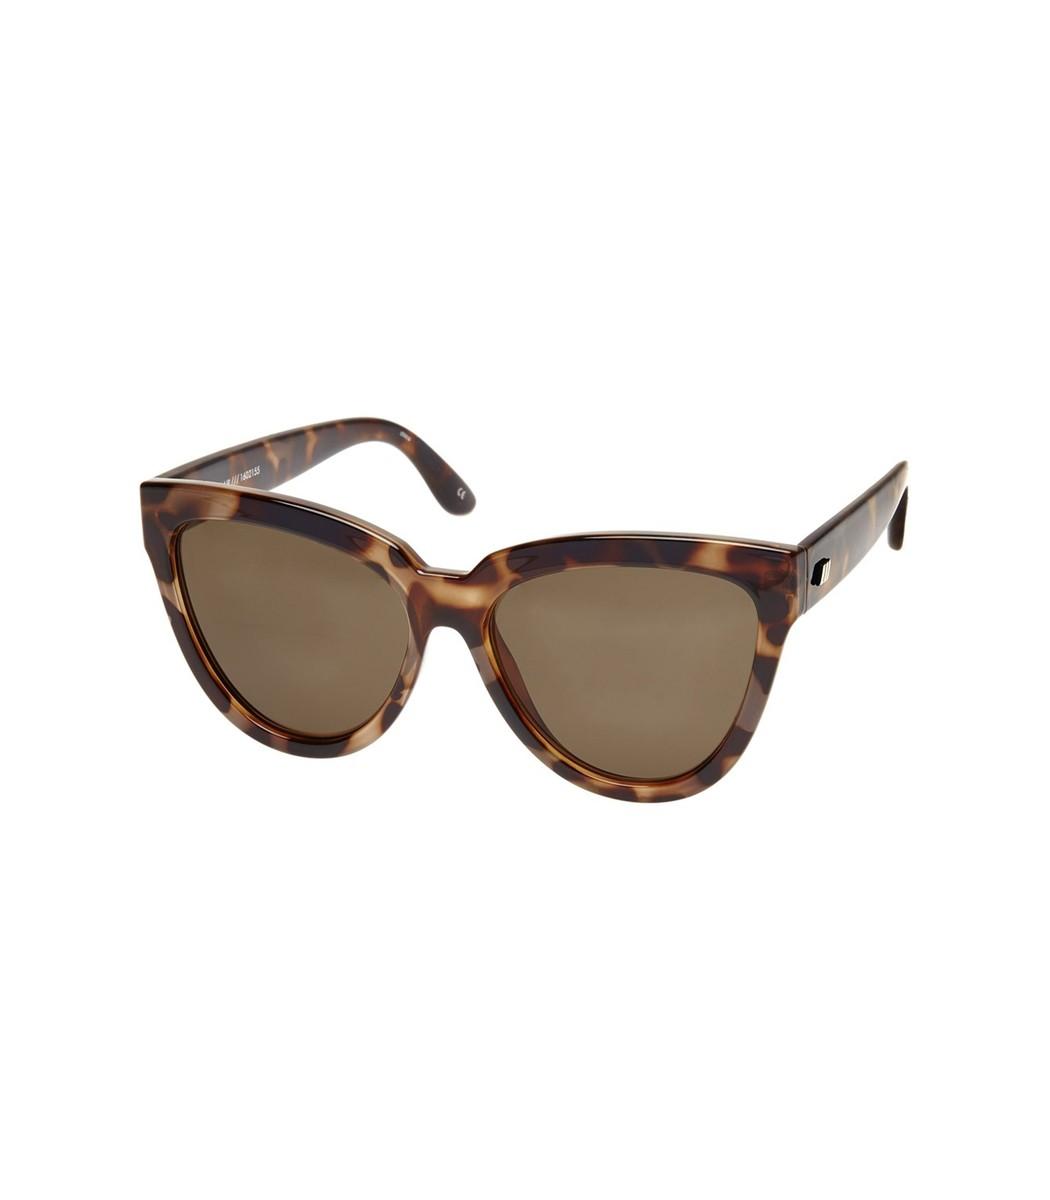 LE SPECS Liar Liar Sunglasses in Volcanic Tort